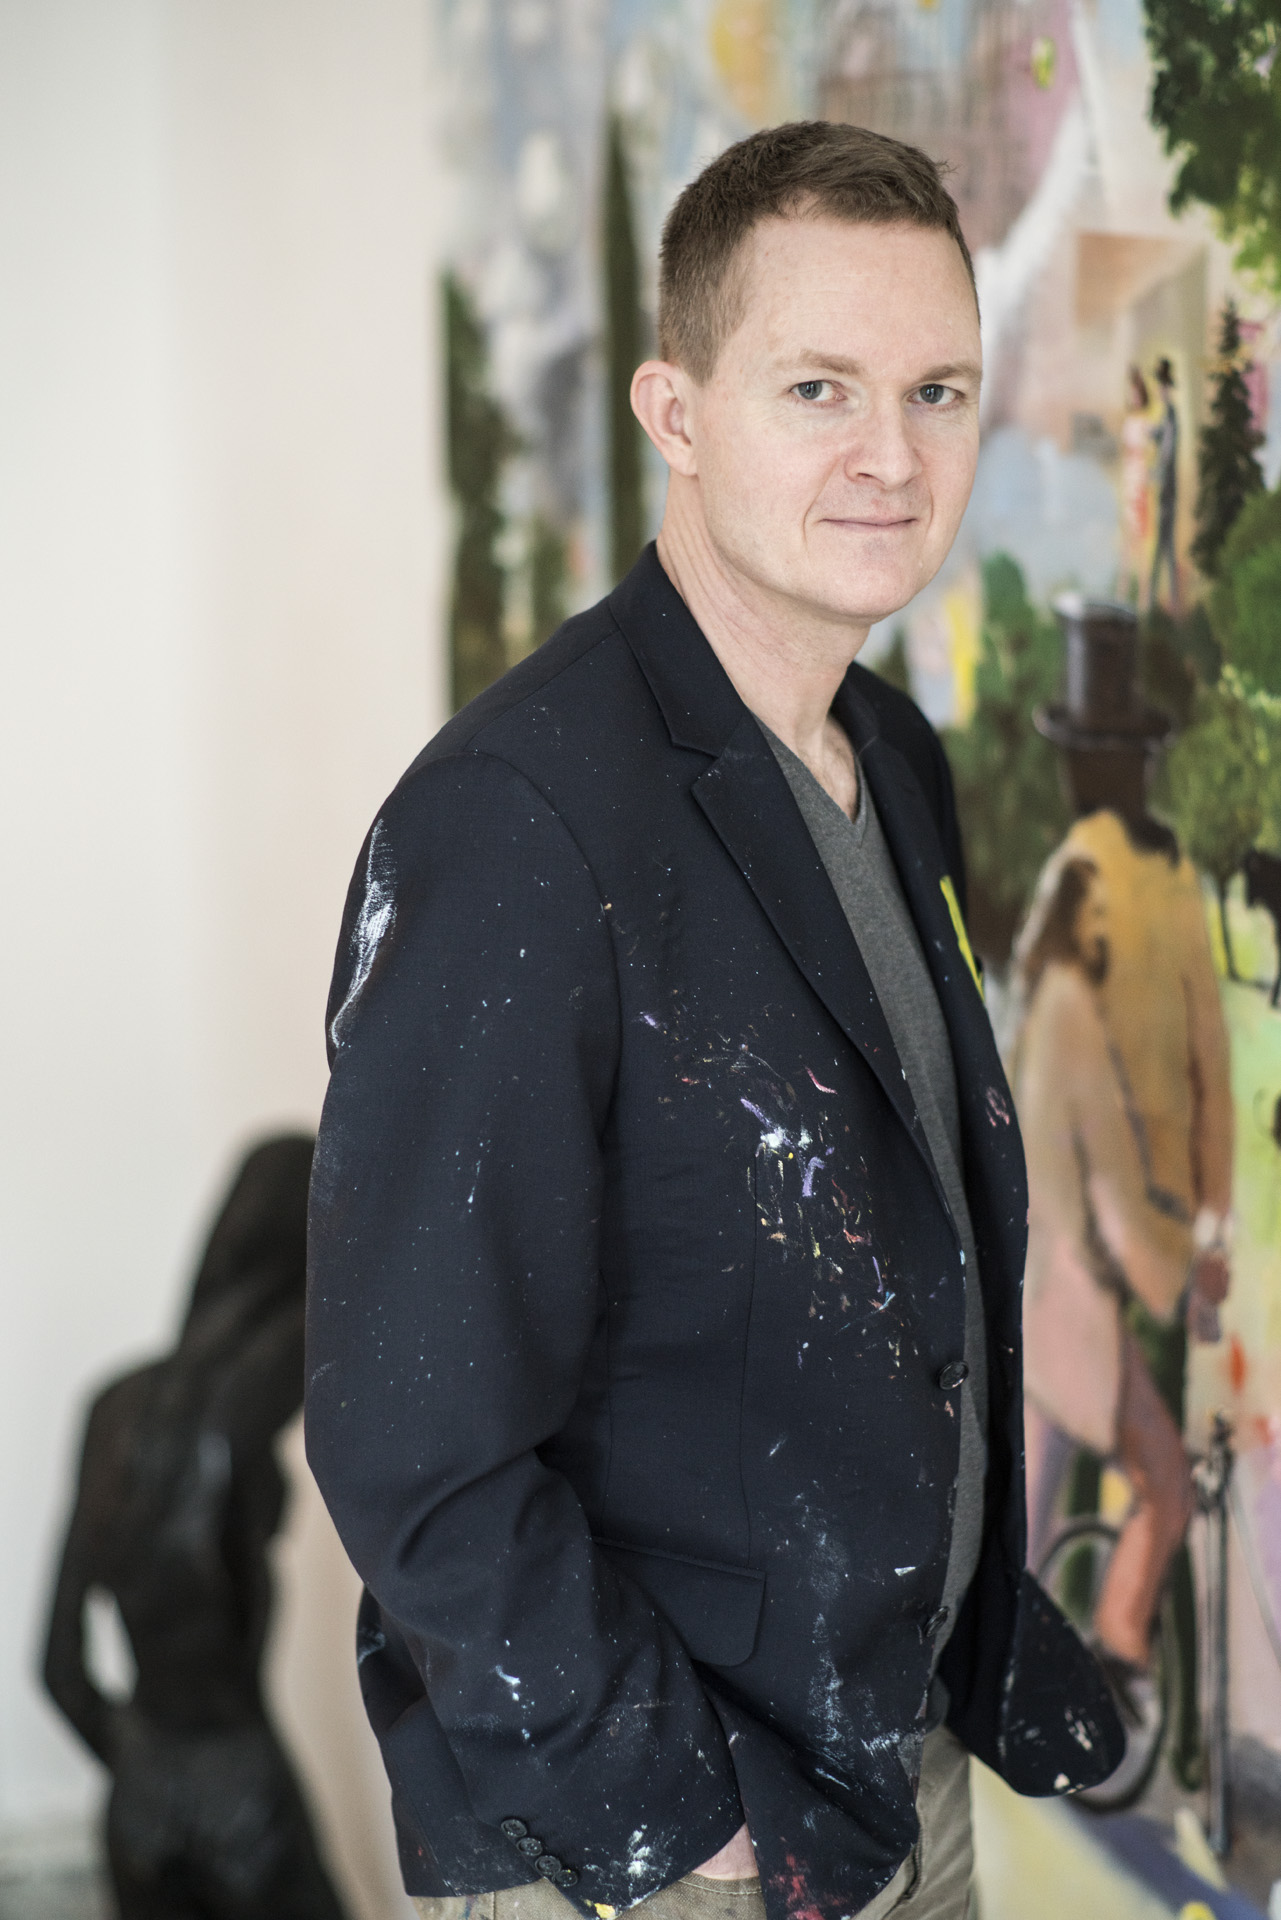 Armin Völkers, painter